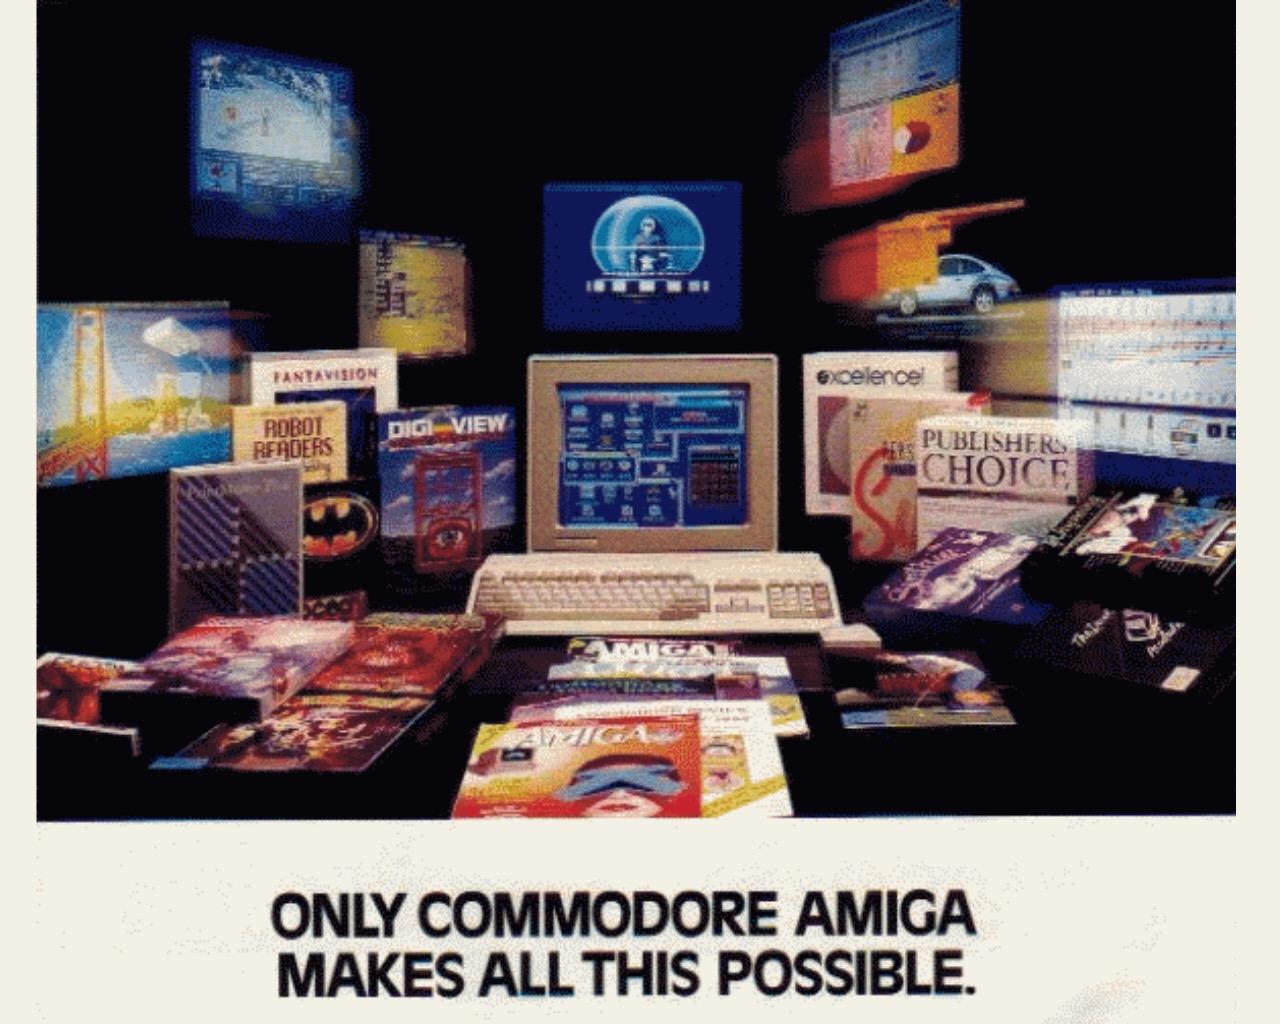 Commodore ignoriert das Potential des genialen Amiga 500